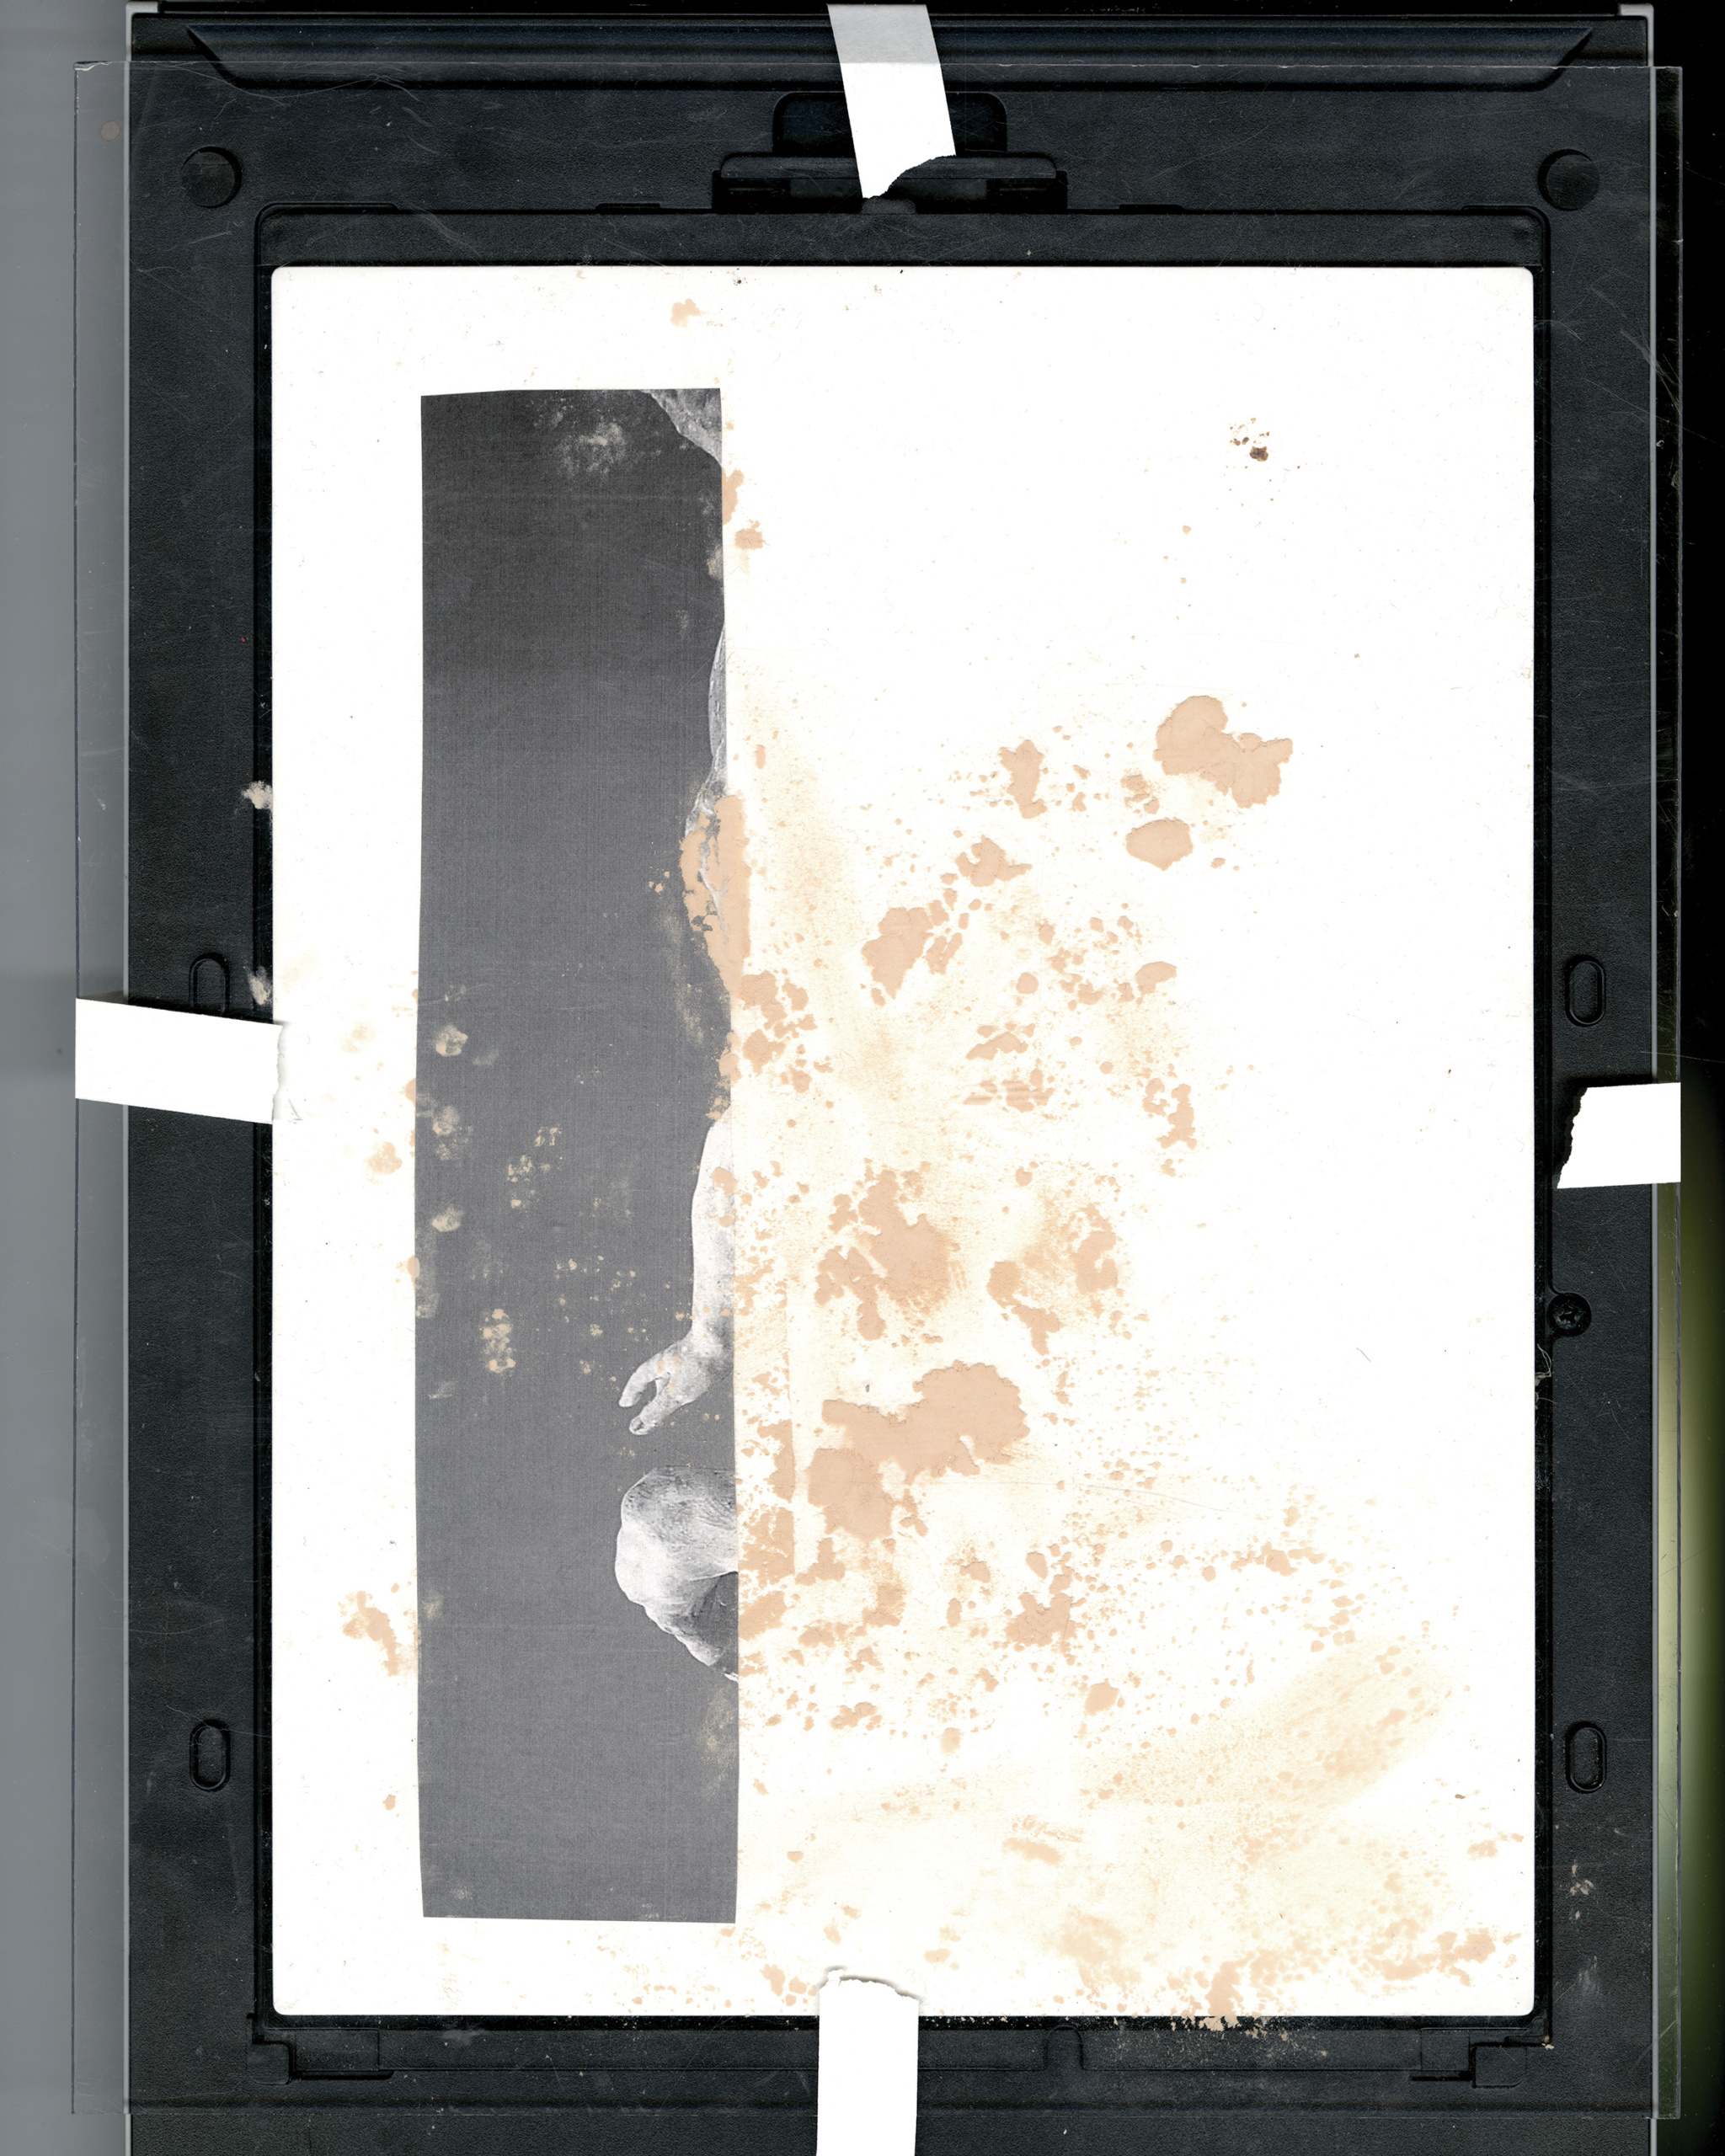 Jackson Klie, Untitled (foundation), 2019. Inkjet print.